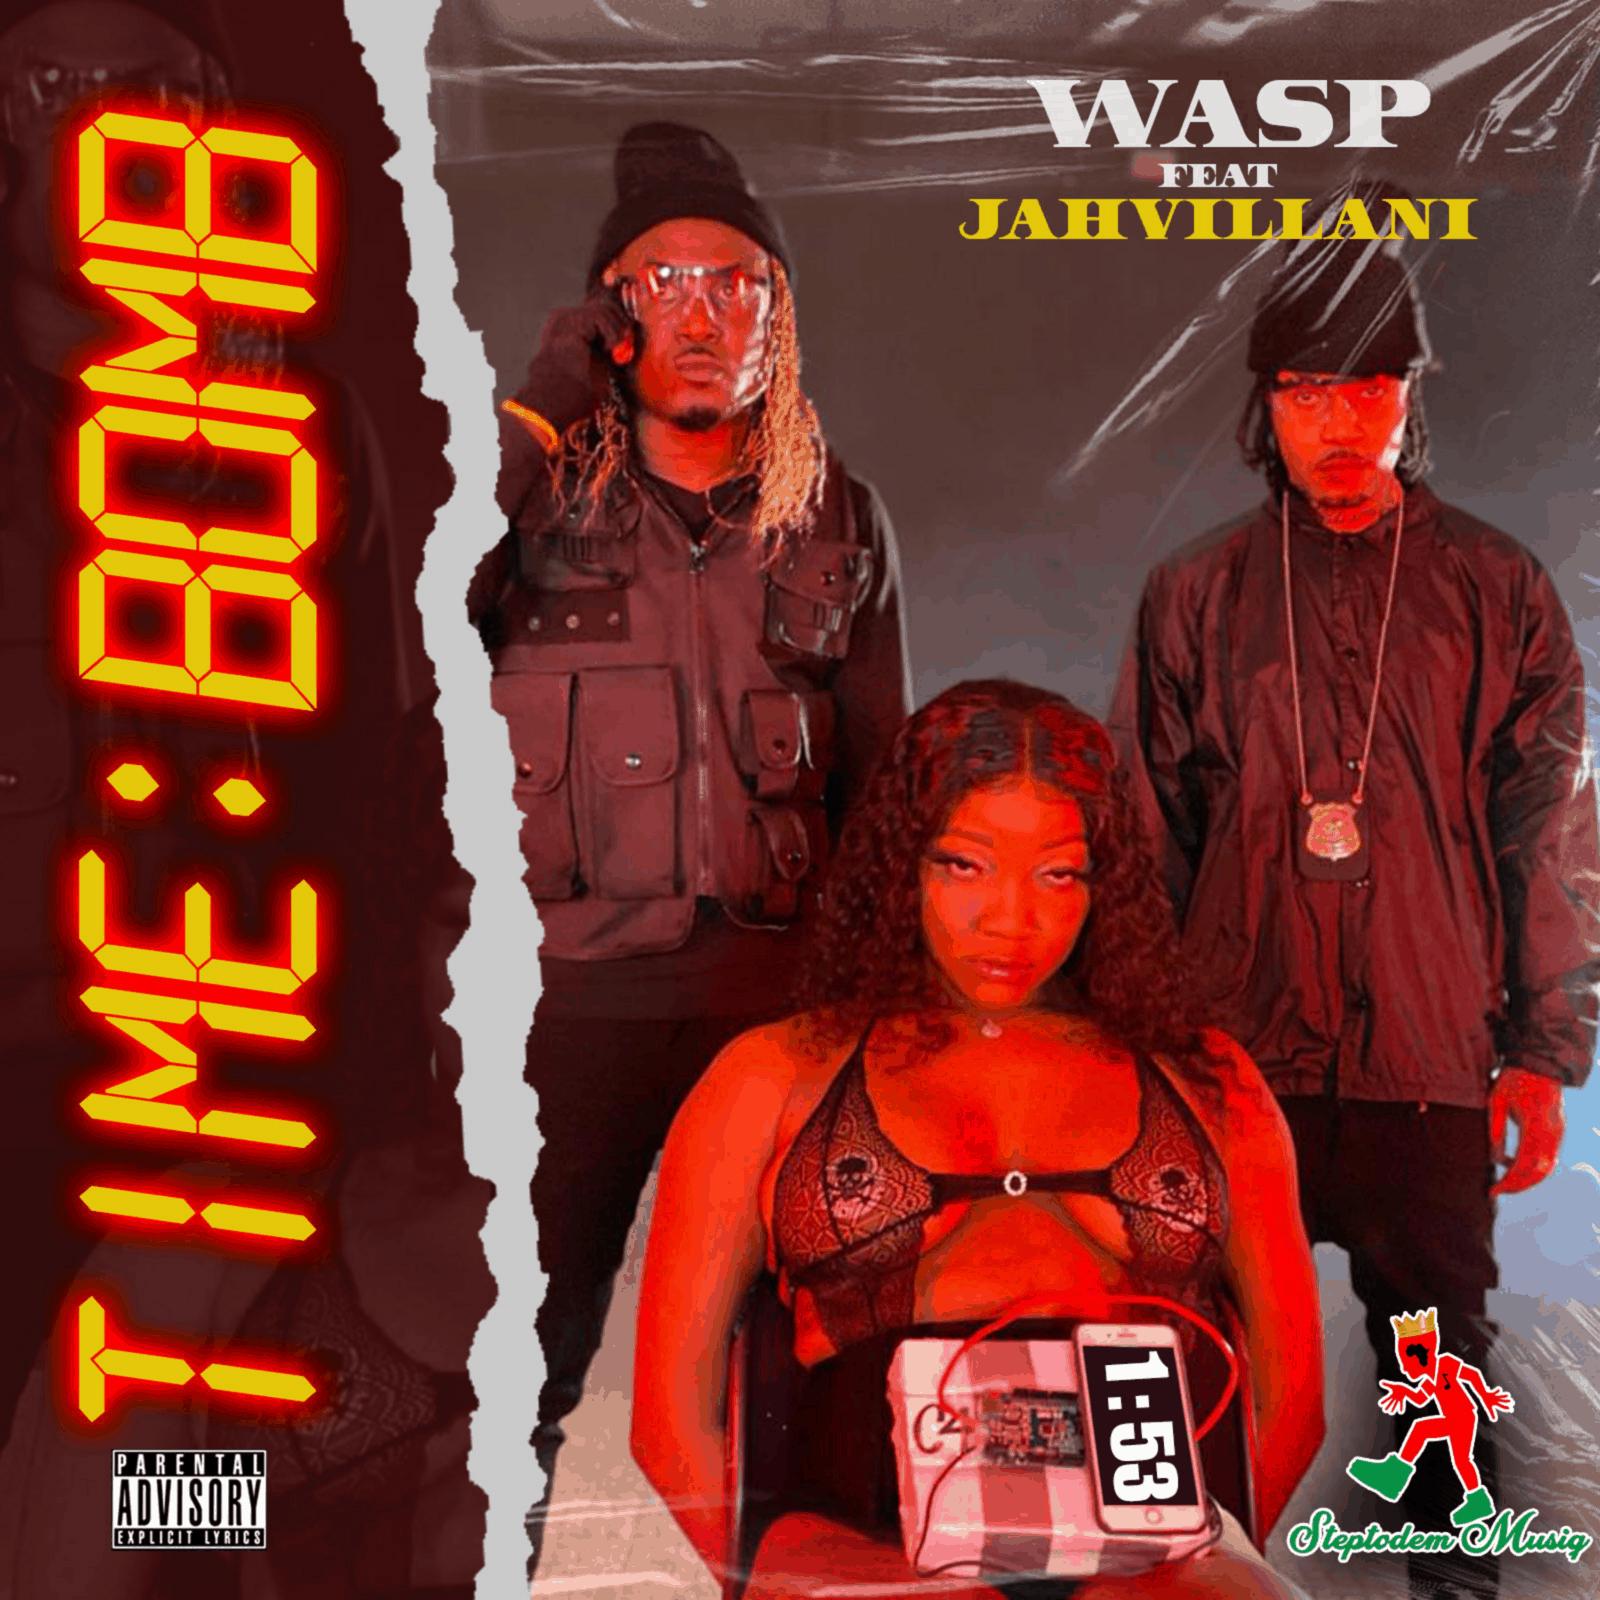 Wasp feat Jahvillani - Time Bomb